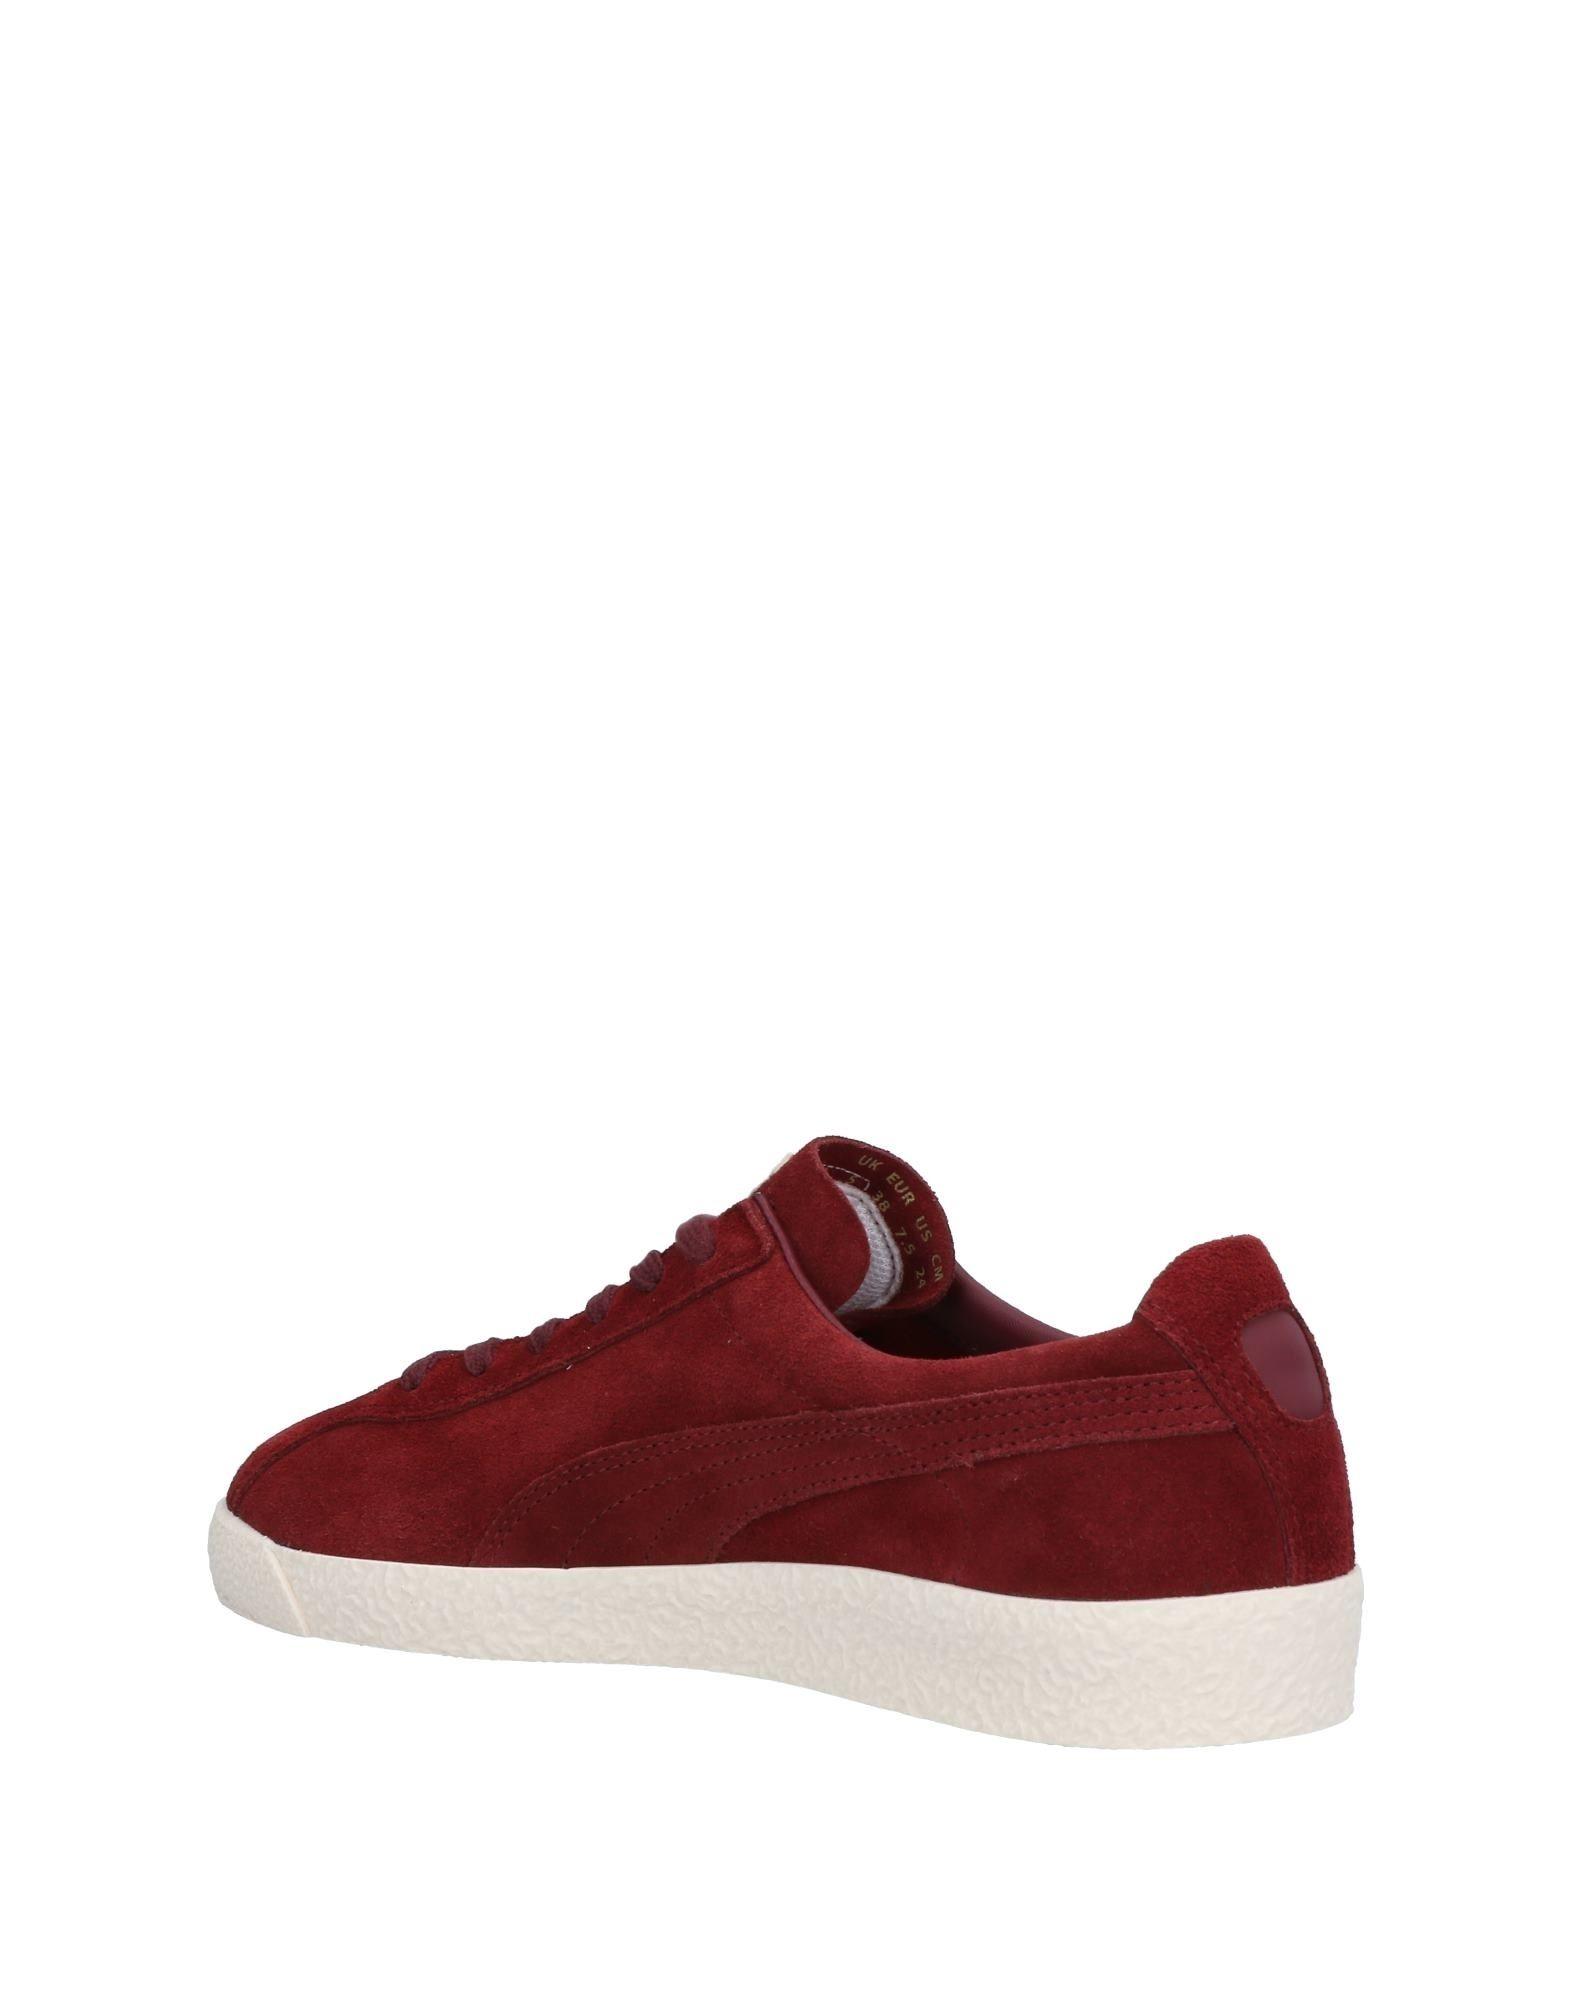 Puma Sneakers Herren  Schuhe 11495641JQ Heiße Schuhe  3277ff